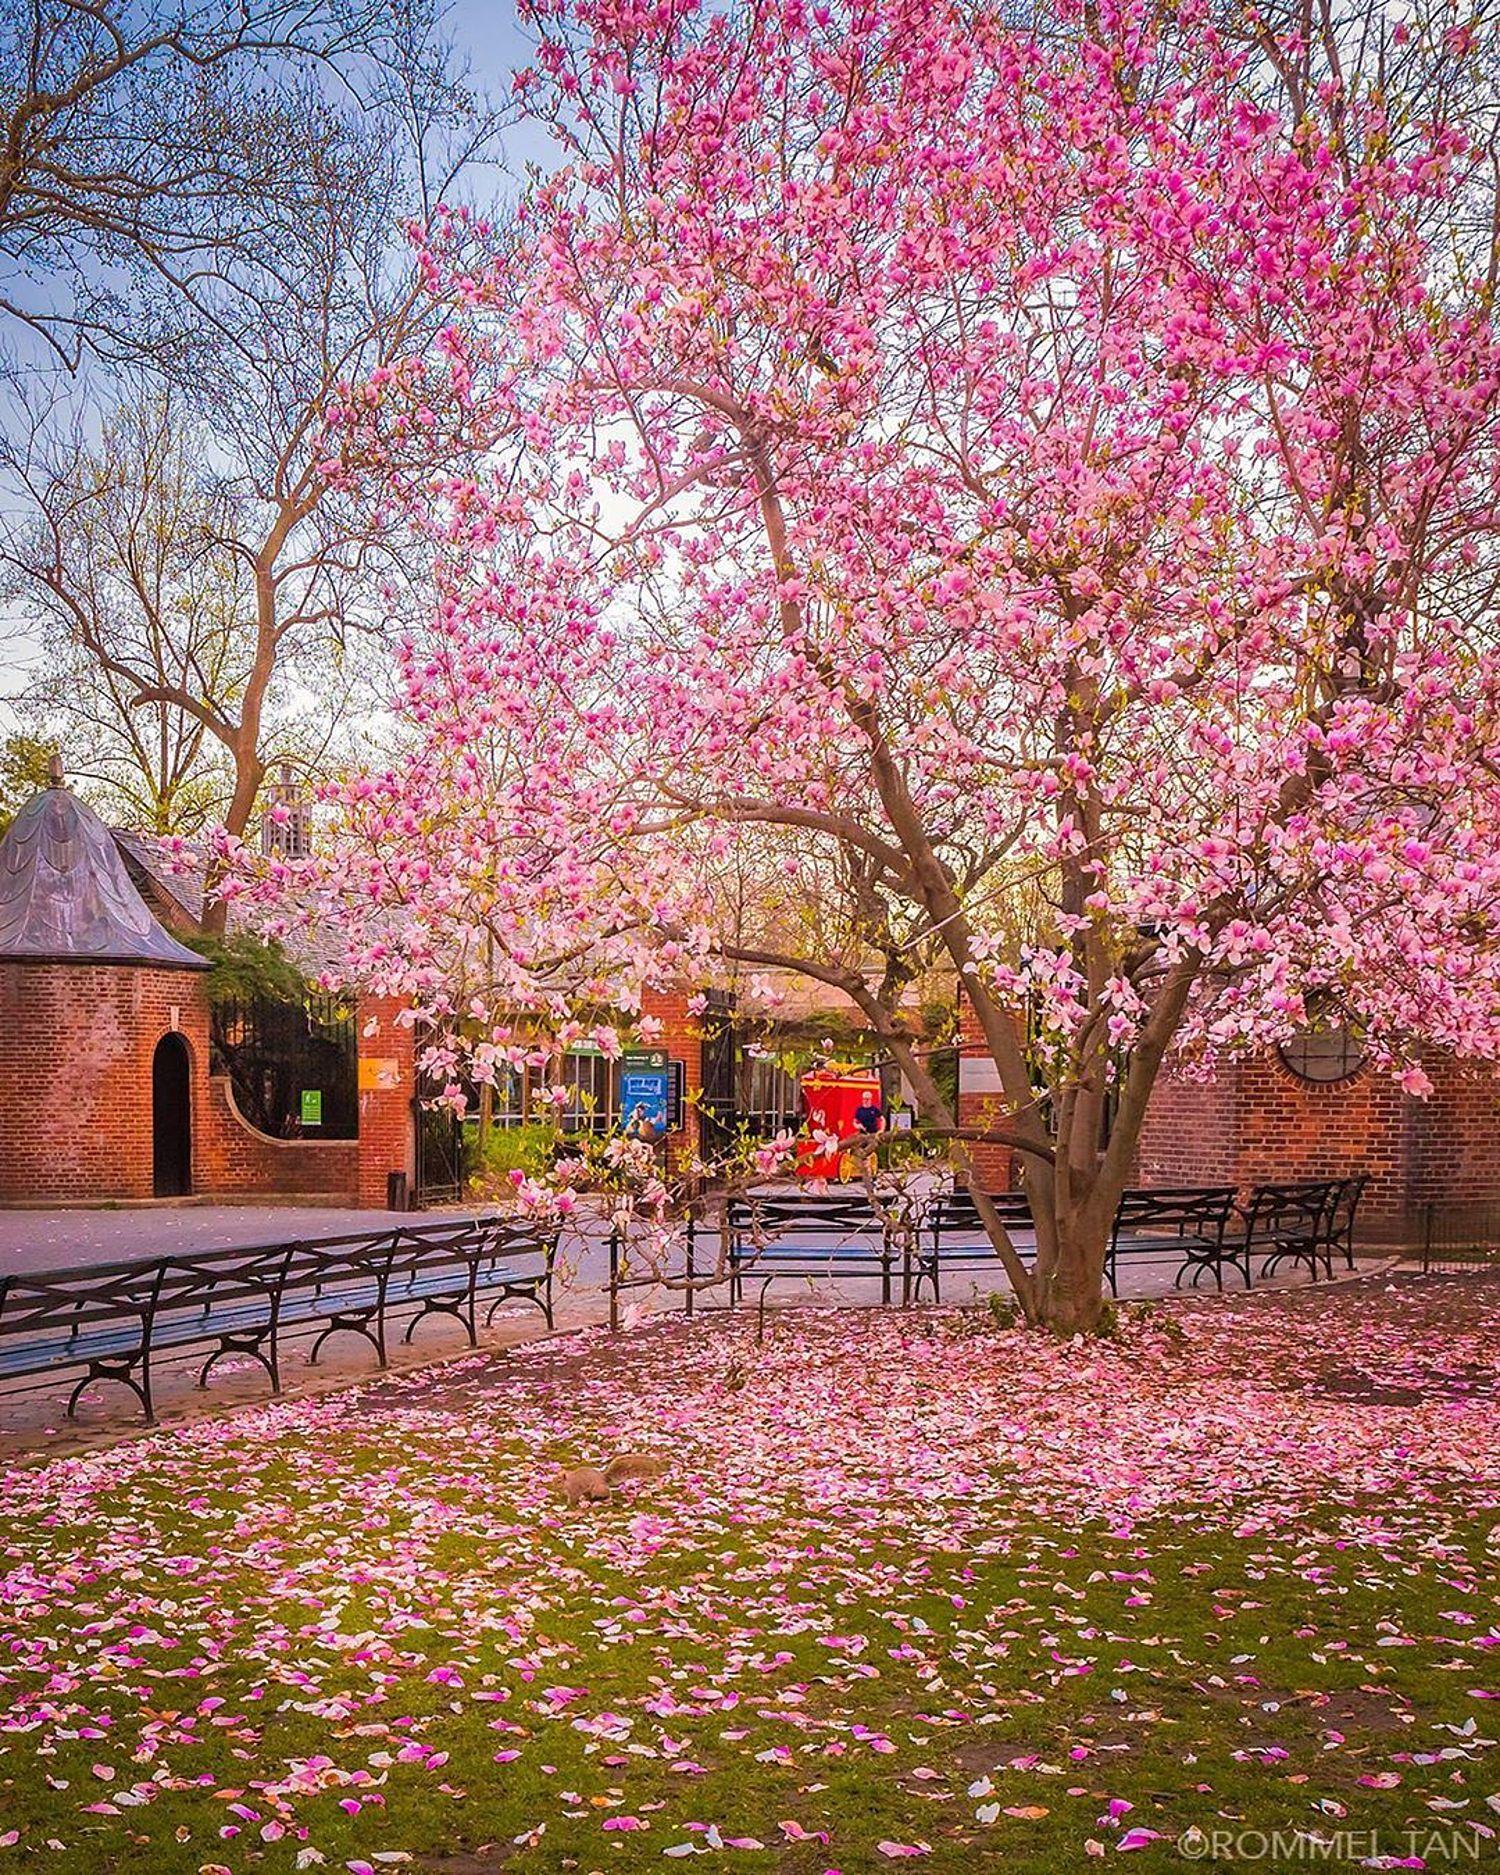 Magnolia Tree, Central Park Zoo, Manhattan